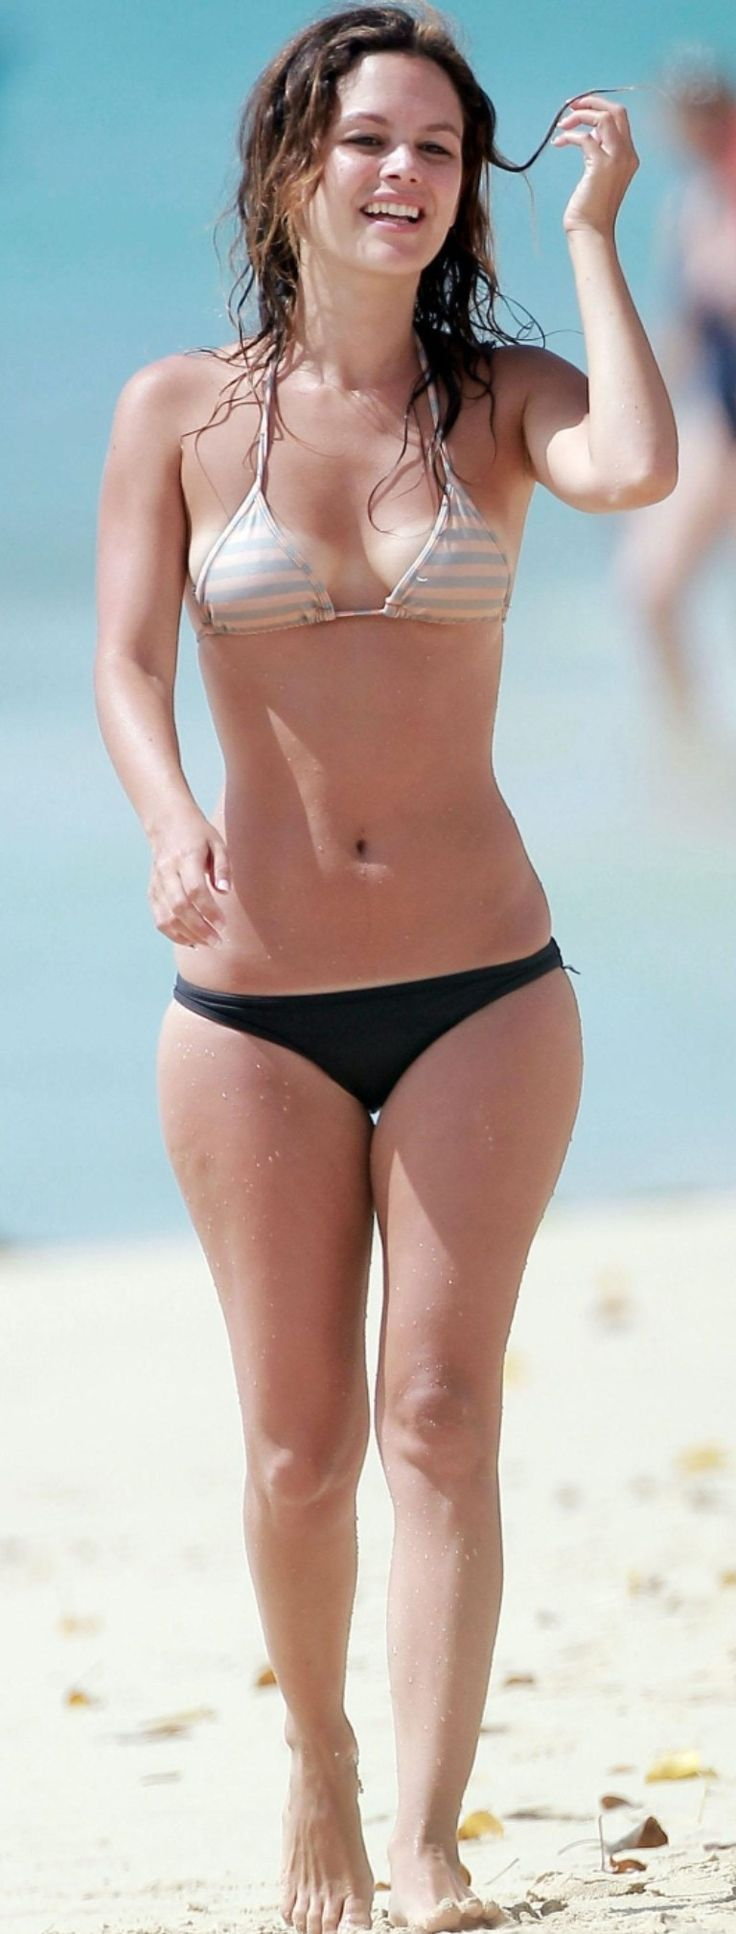 Rachel mcadams bikini